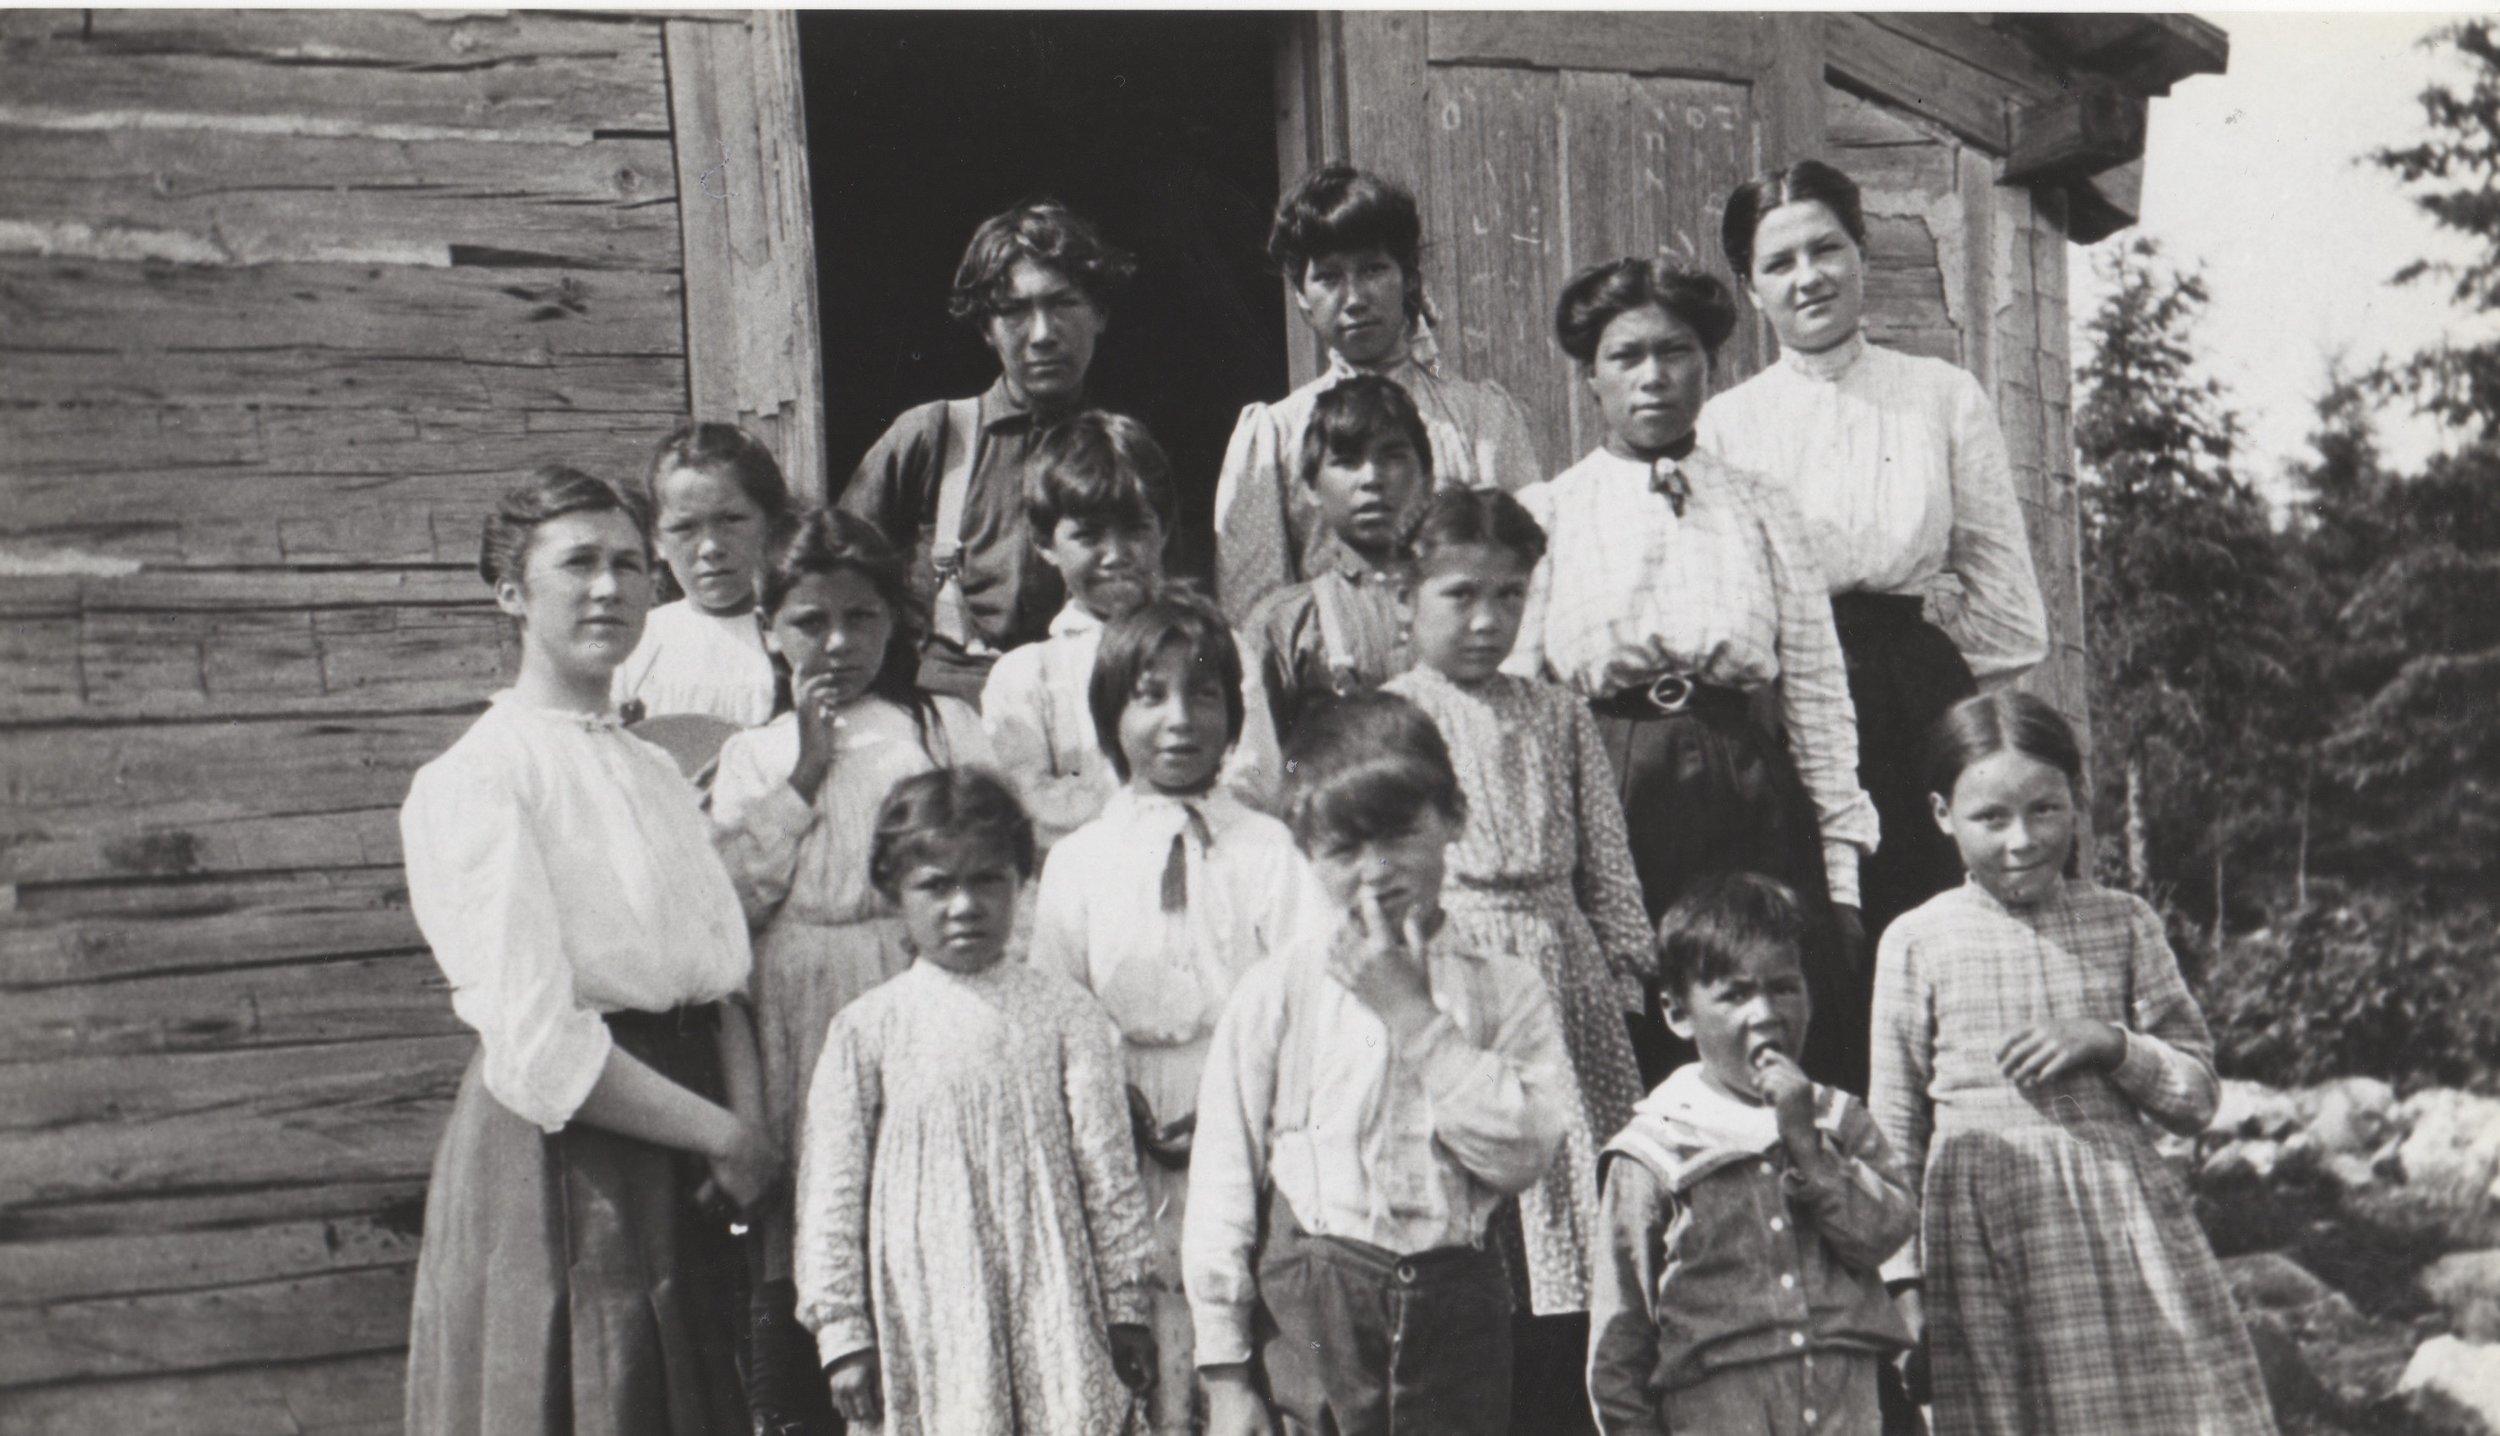 0004_Duncan Campbell Scott_ The Poet and The Indians_ Bear Islana, Temaqami (1905).jpeg